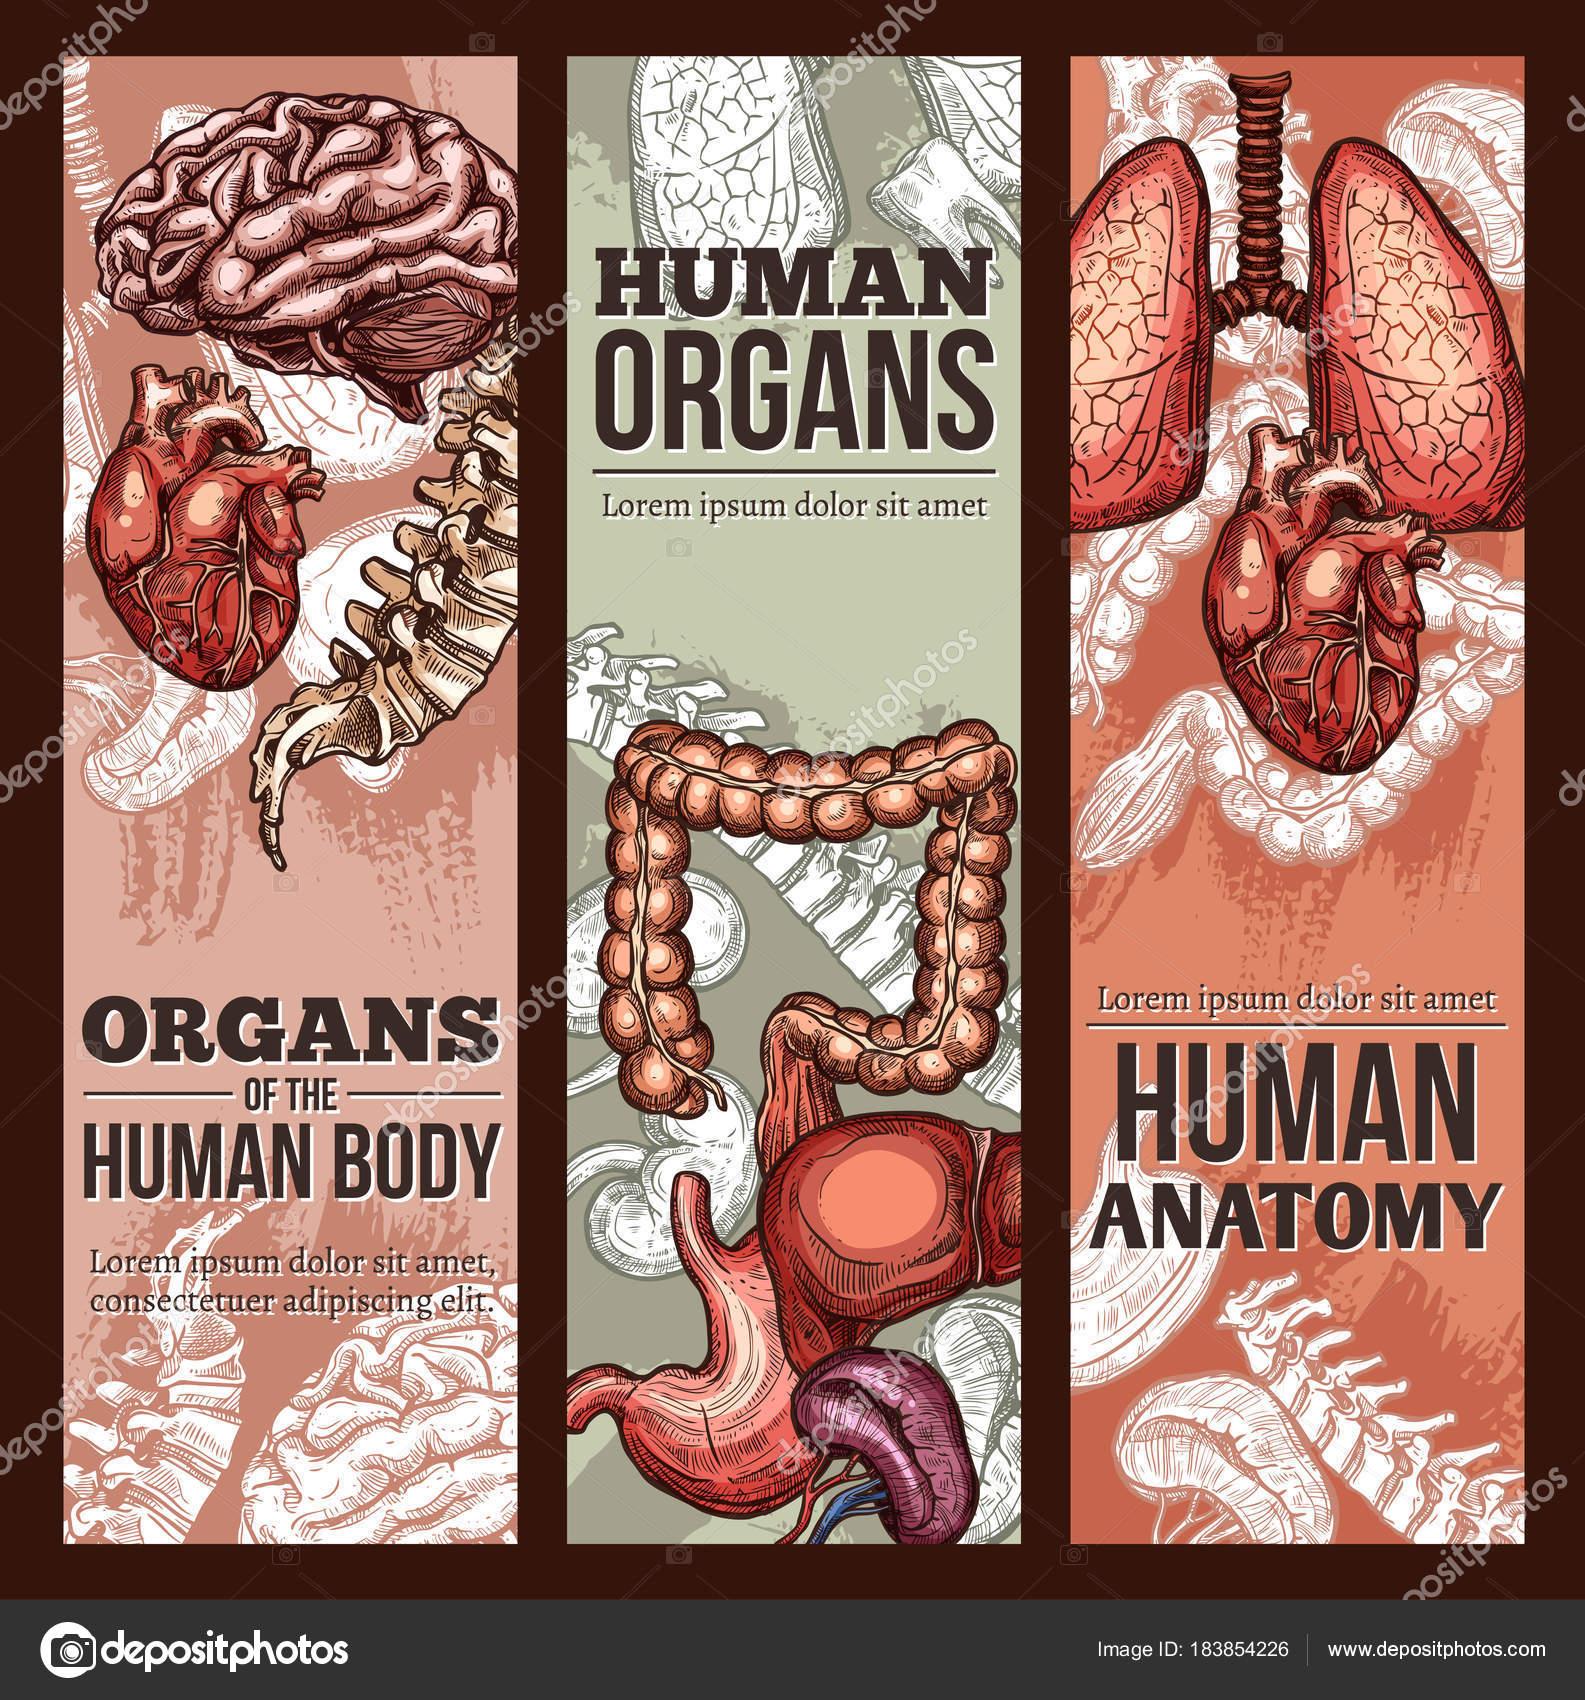 Menschliche Organe Vektor Skizze Anatomie poster — Stockvektor ...